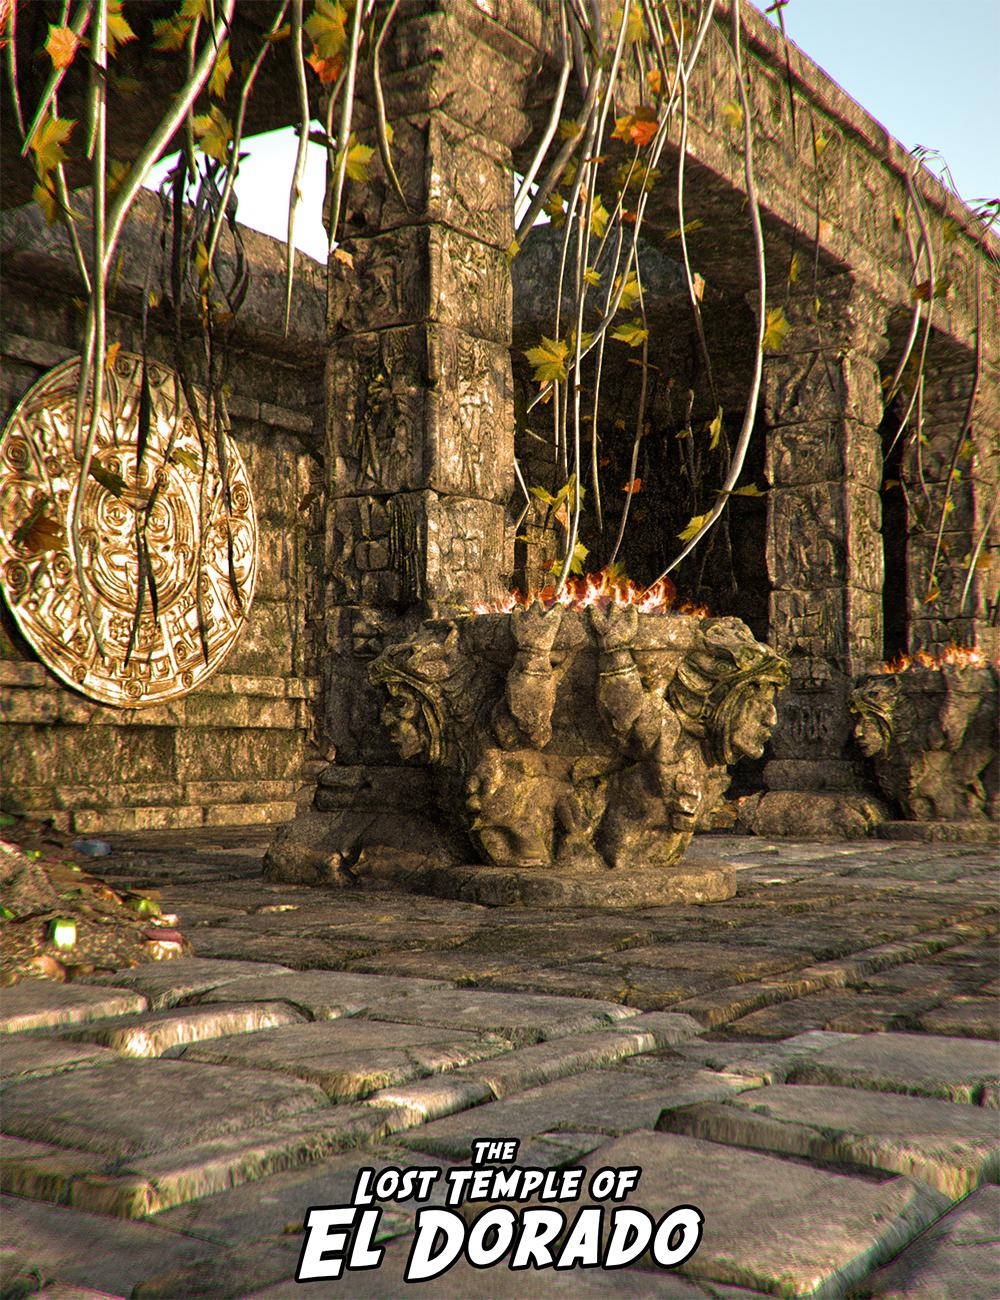 Lost Temples: El Dorado by: Luthbel, 3D Models by Daz 3D